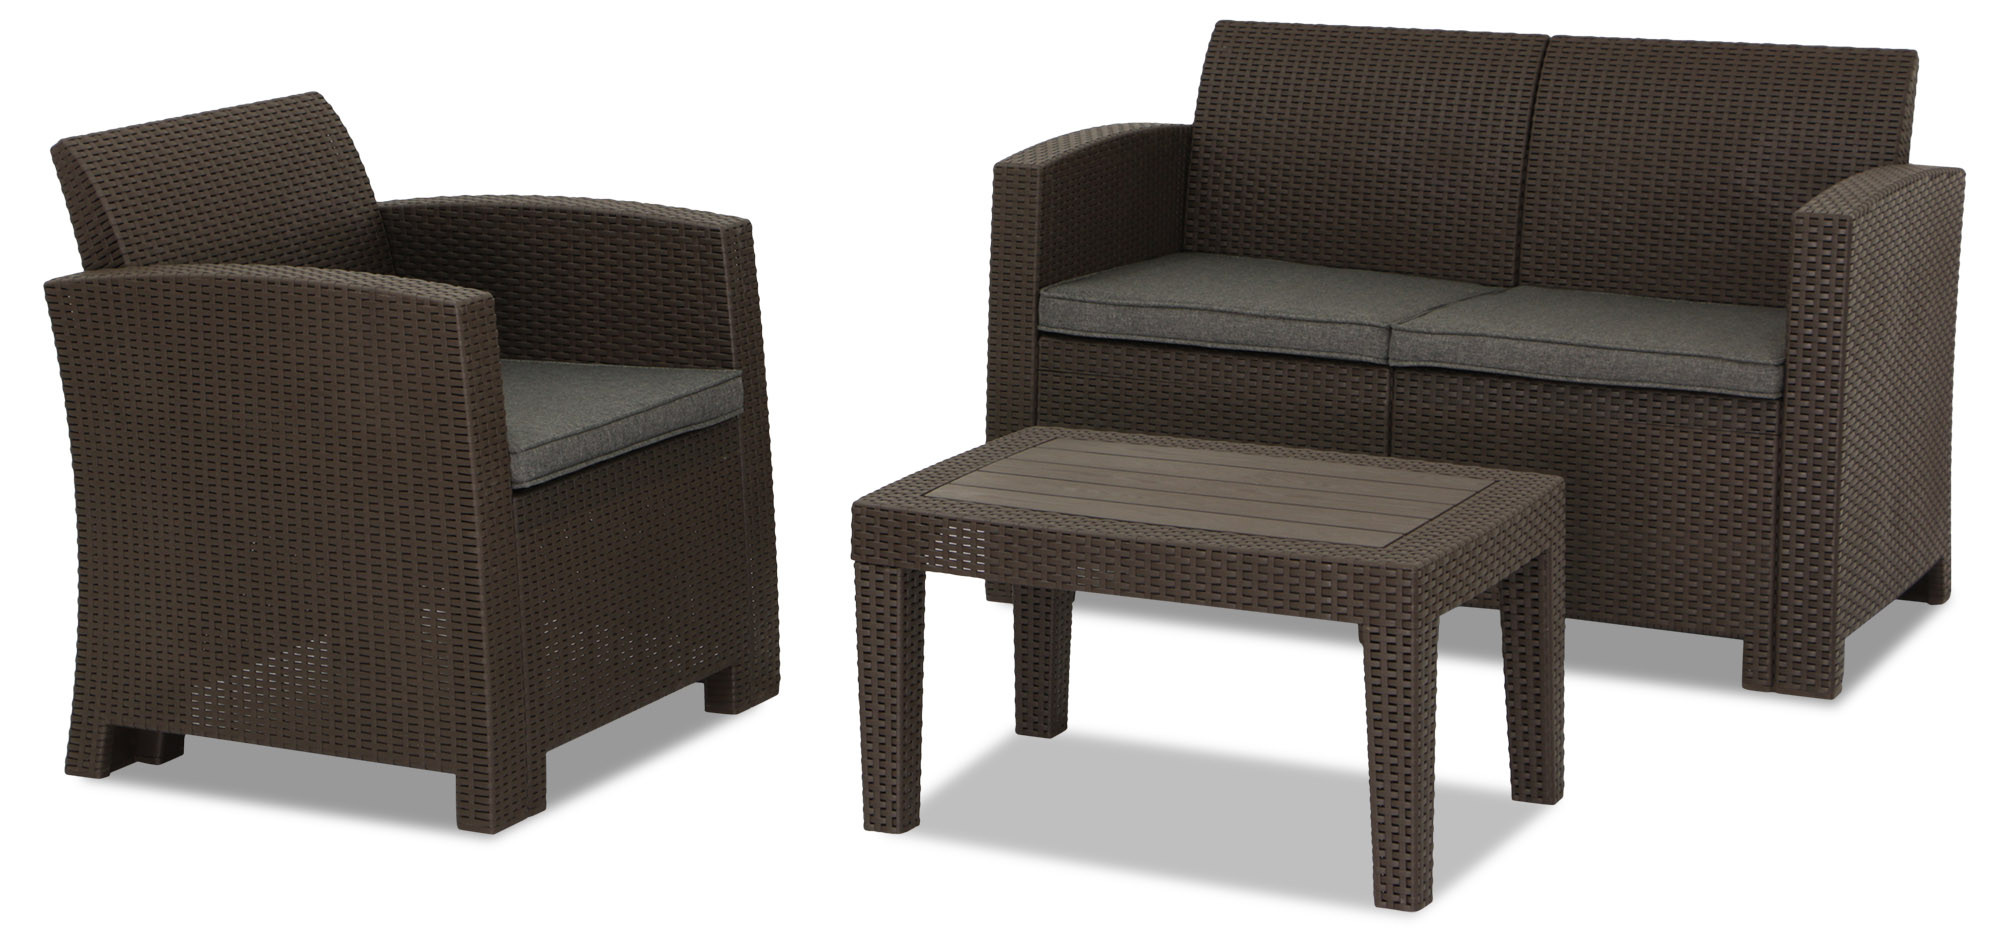 Nina 4 seater outdoor sofa set brown furniture home for 9 seater sofa set